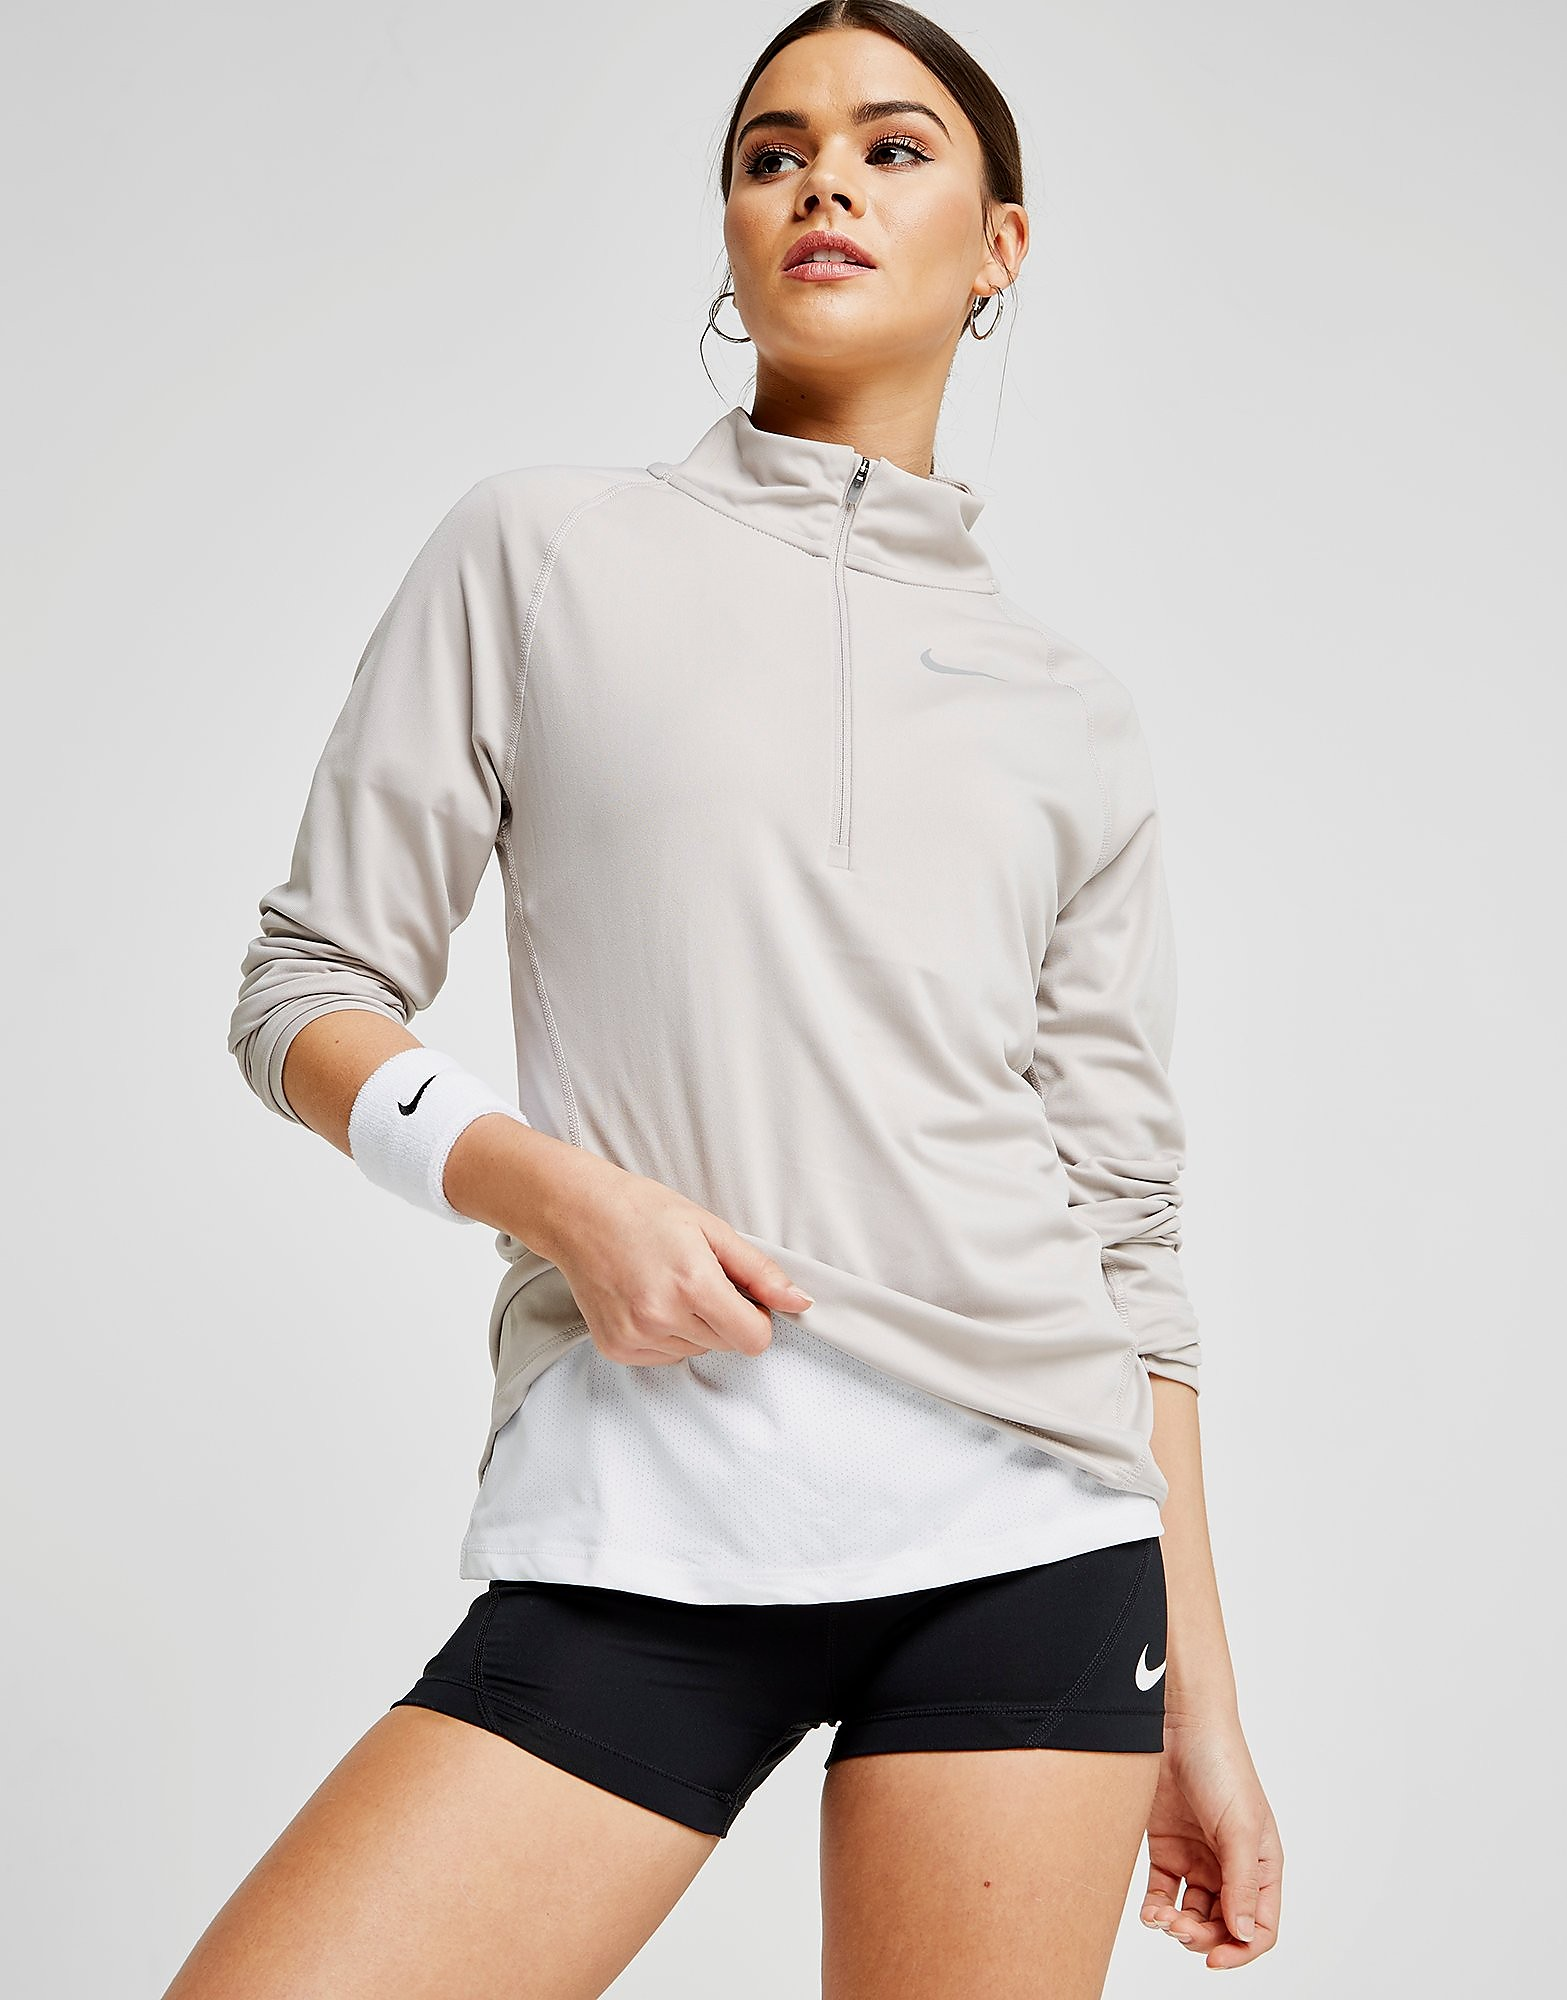 Nike Core Running Top